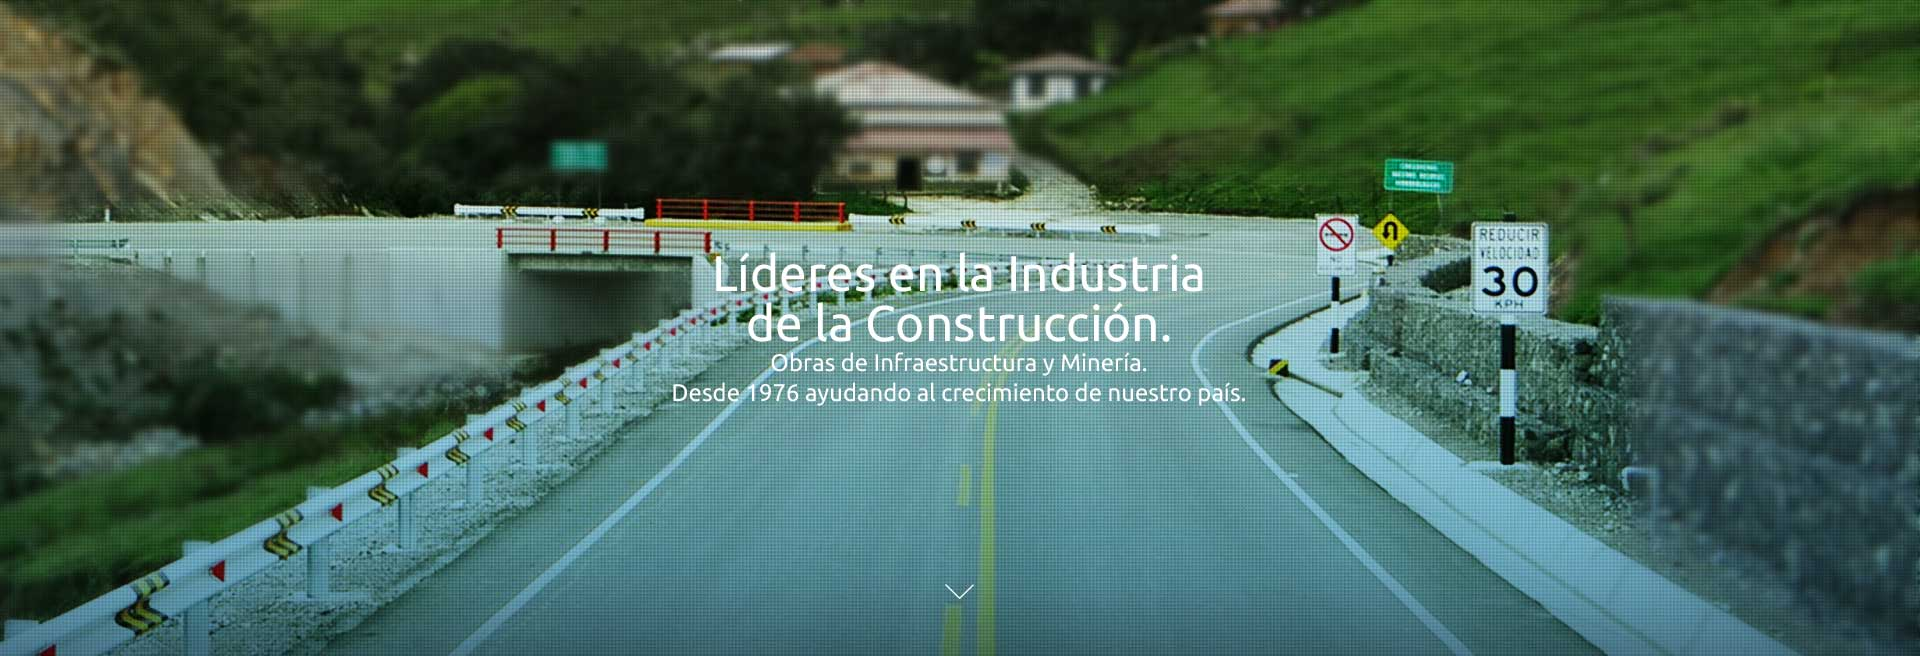 construccion-carreteras-johesa